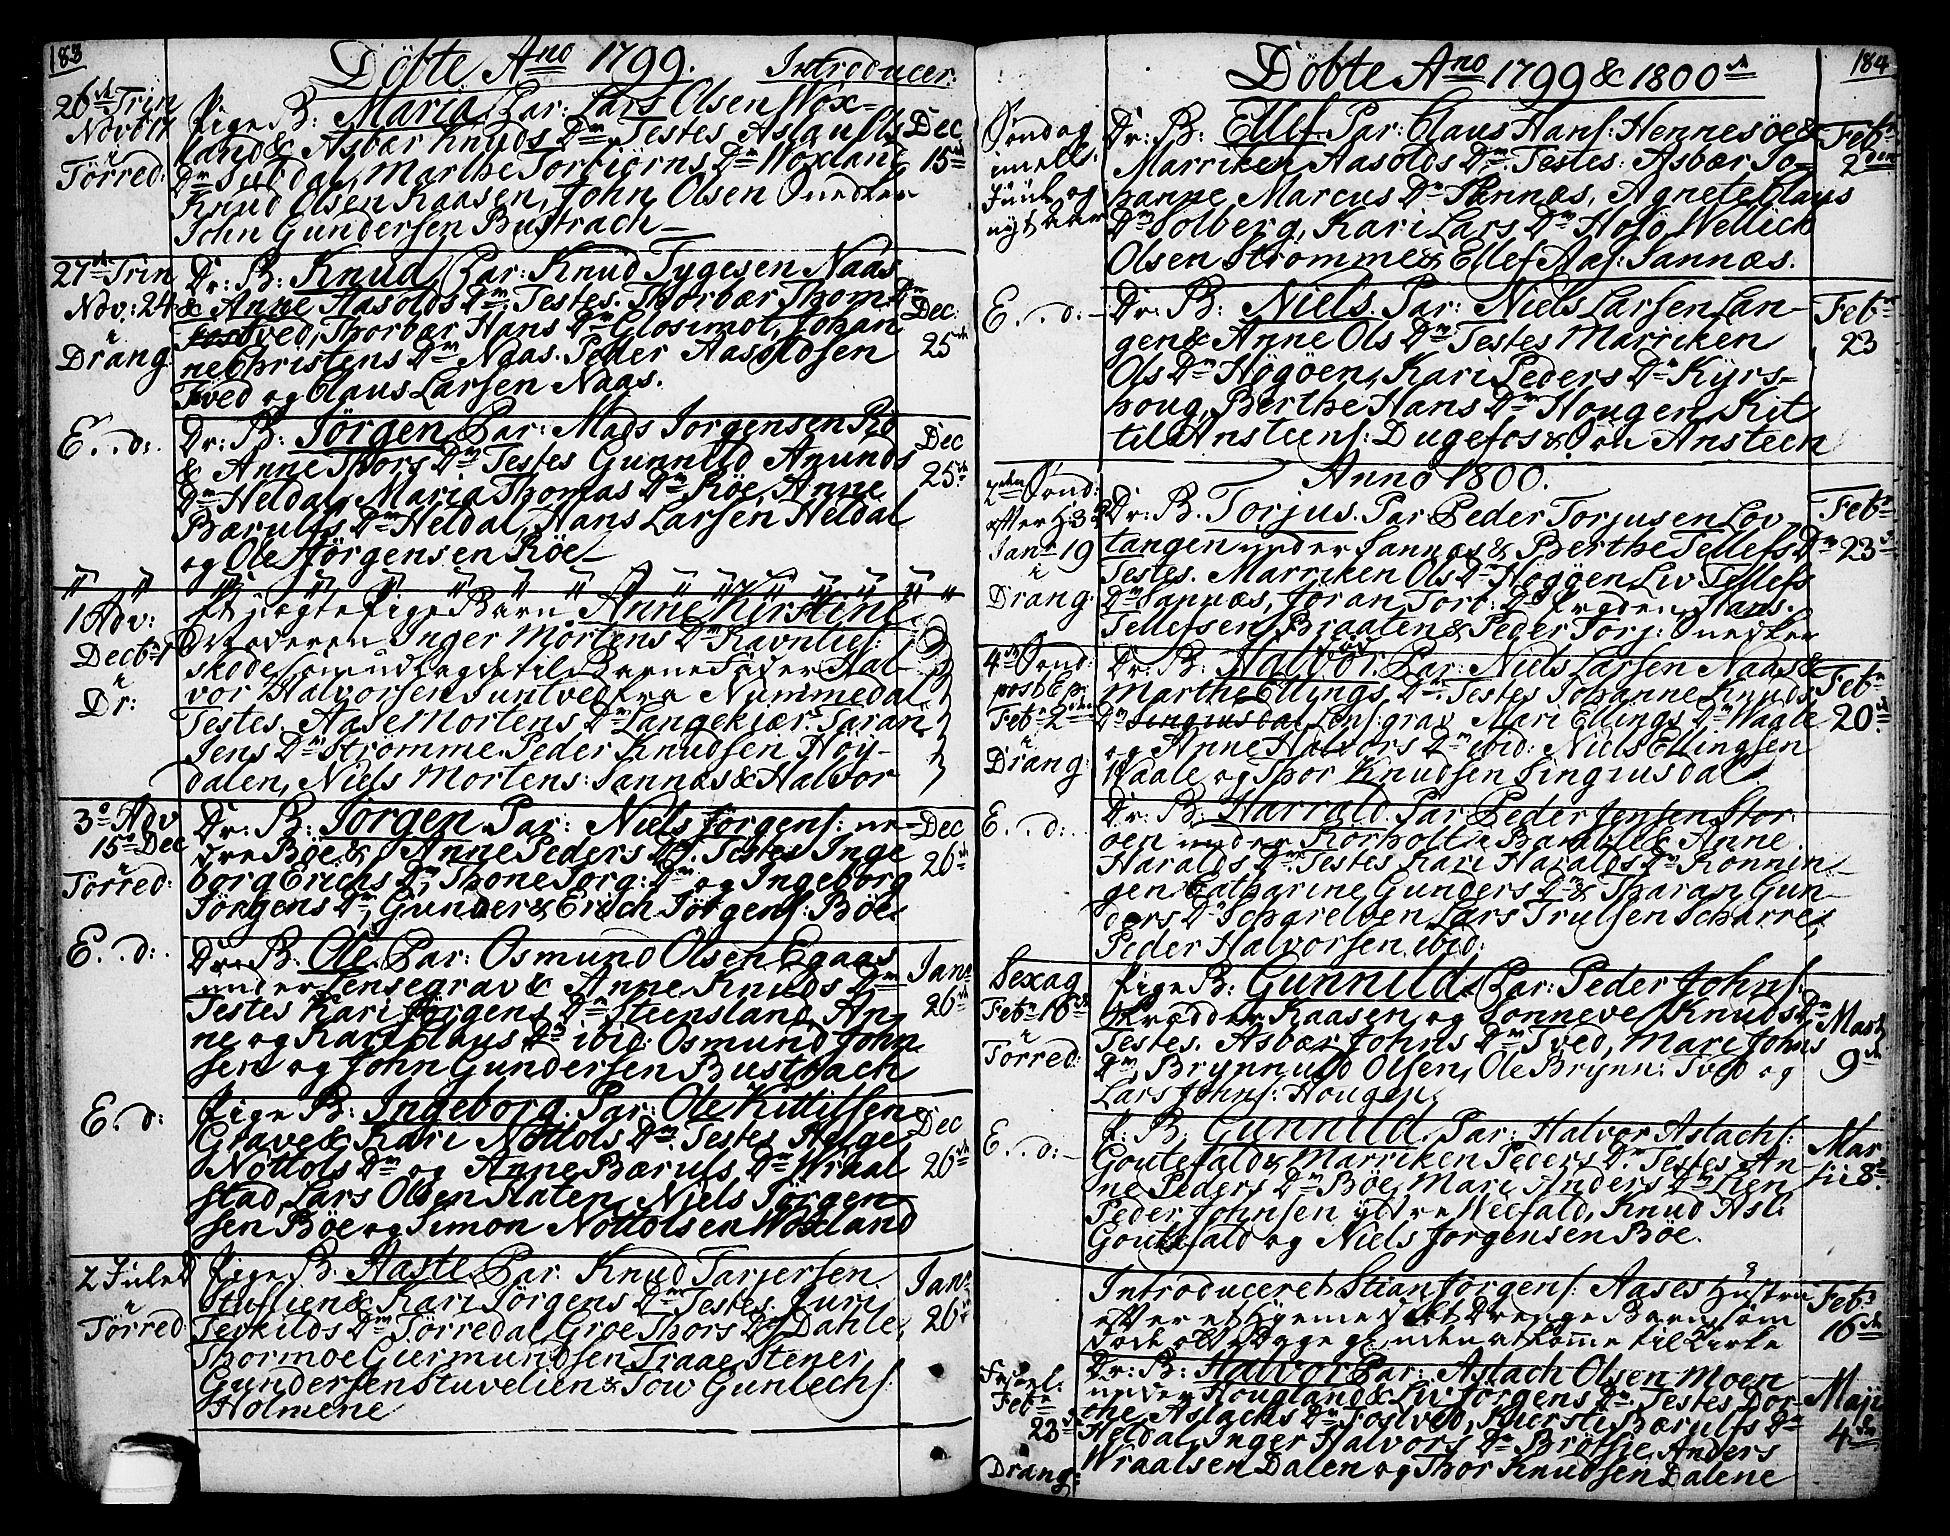 SAKO, Drangedal kirkebøker, F/Fa/L0003: Ministerialbok nr. 3, 1768-1814, s. 183-184